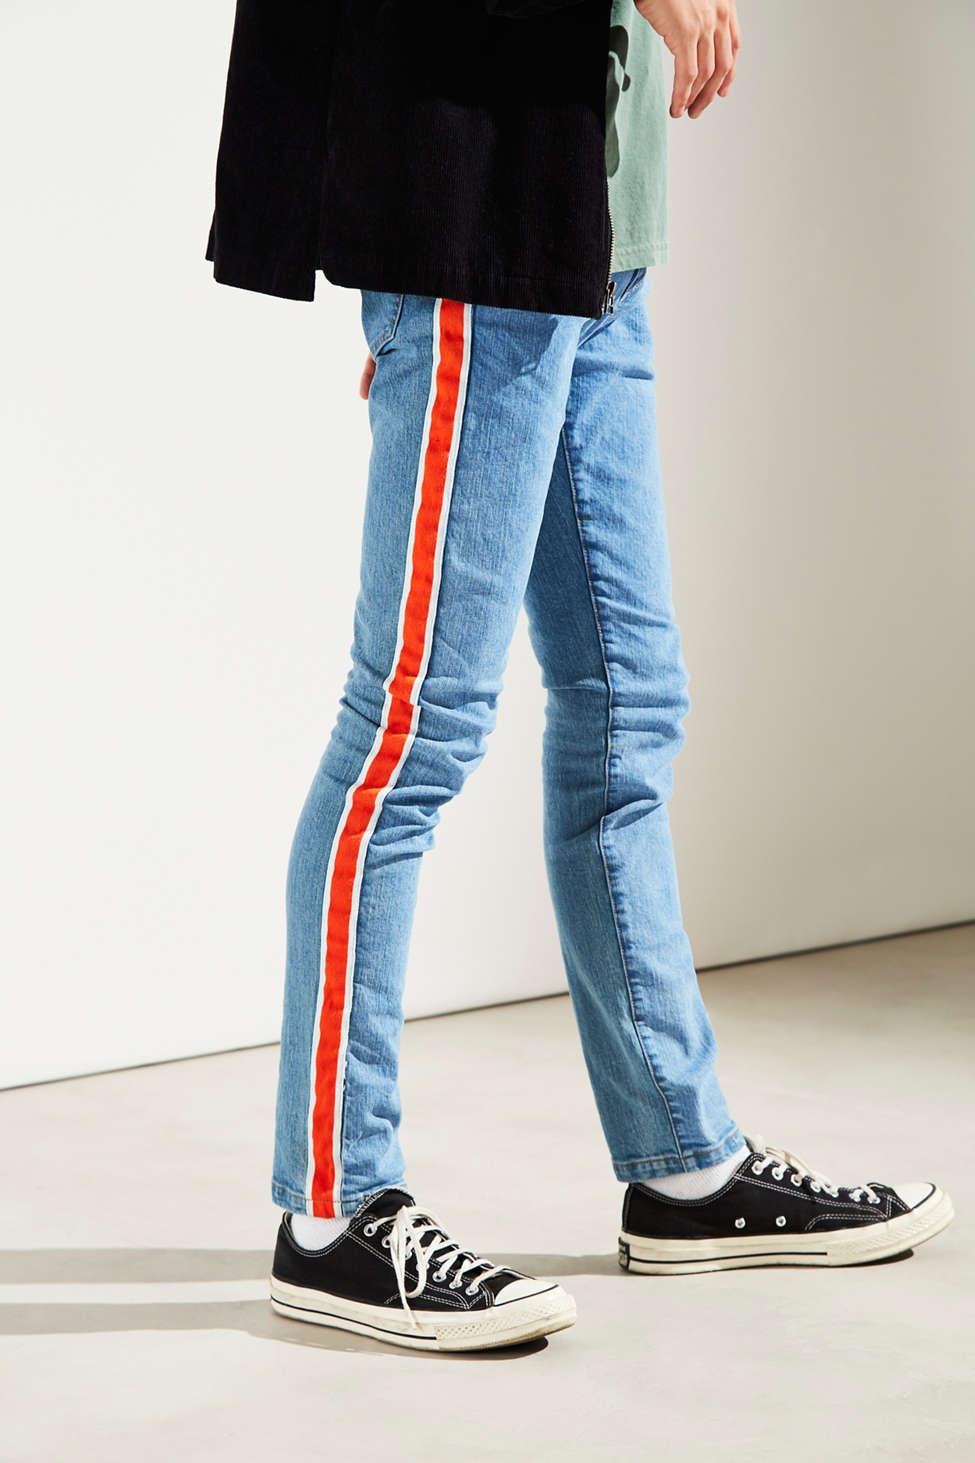 36 X 30 Mens Jeans